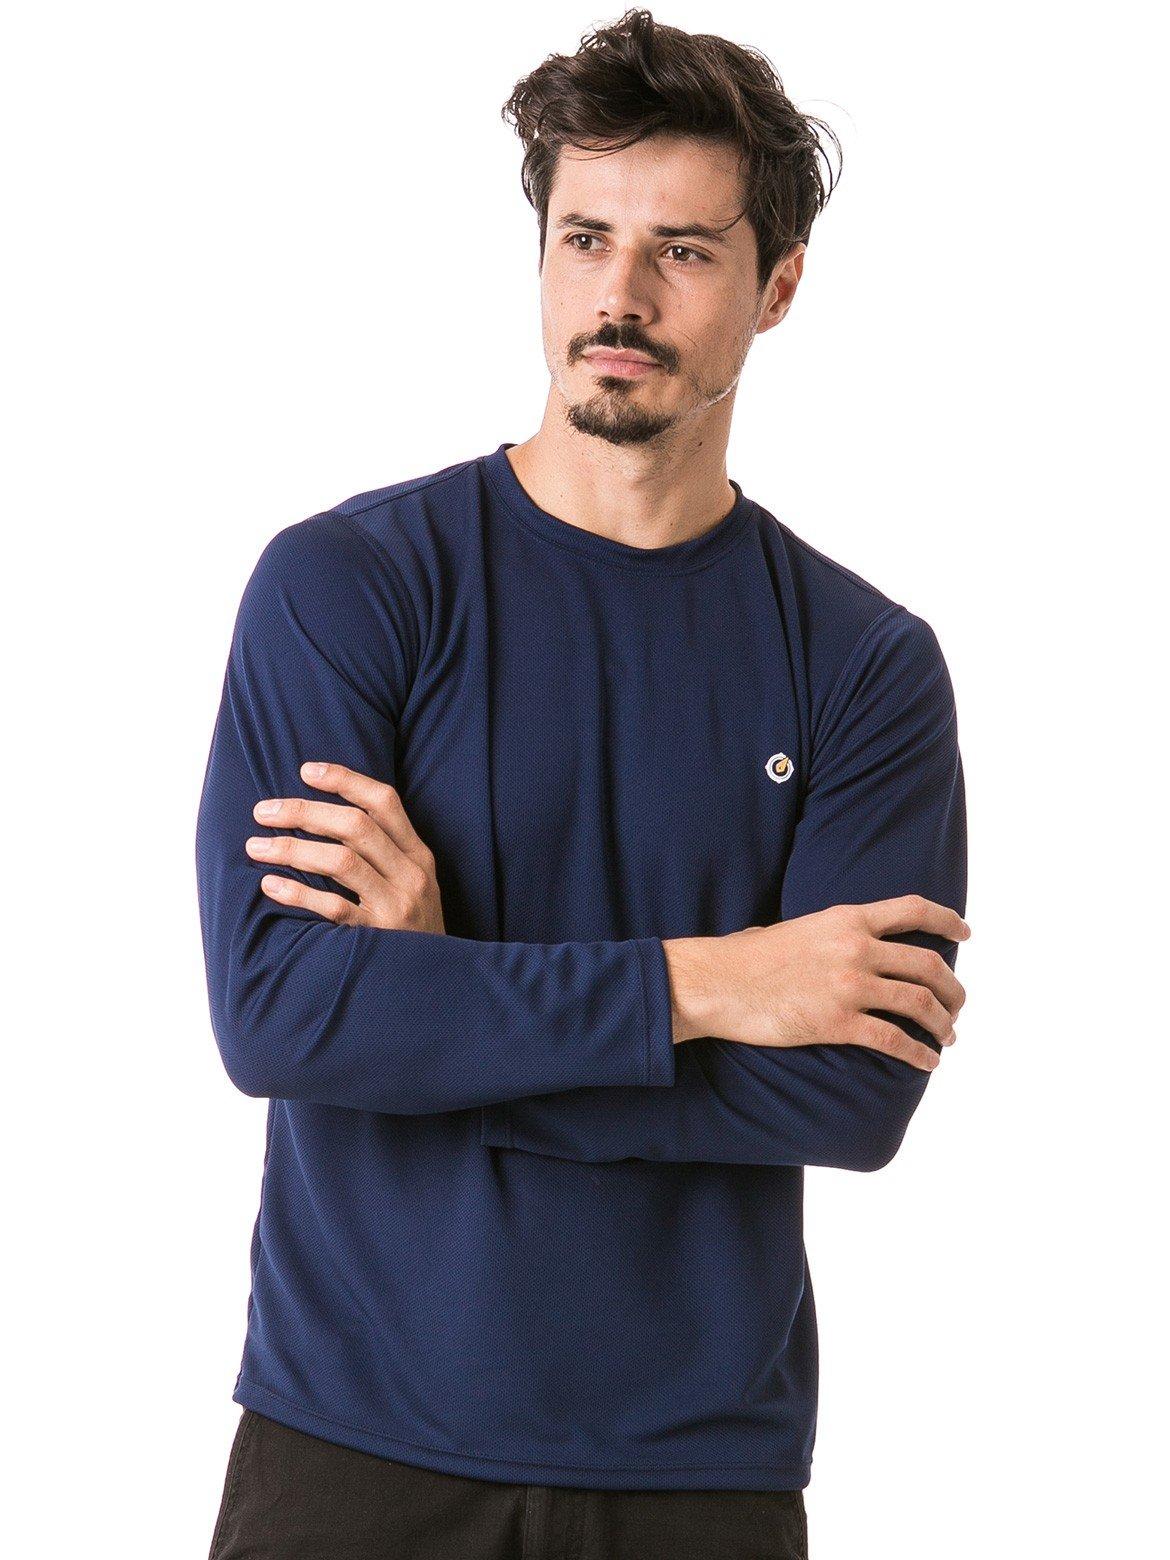 masculina t shirt longa dry azul frente 2 b